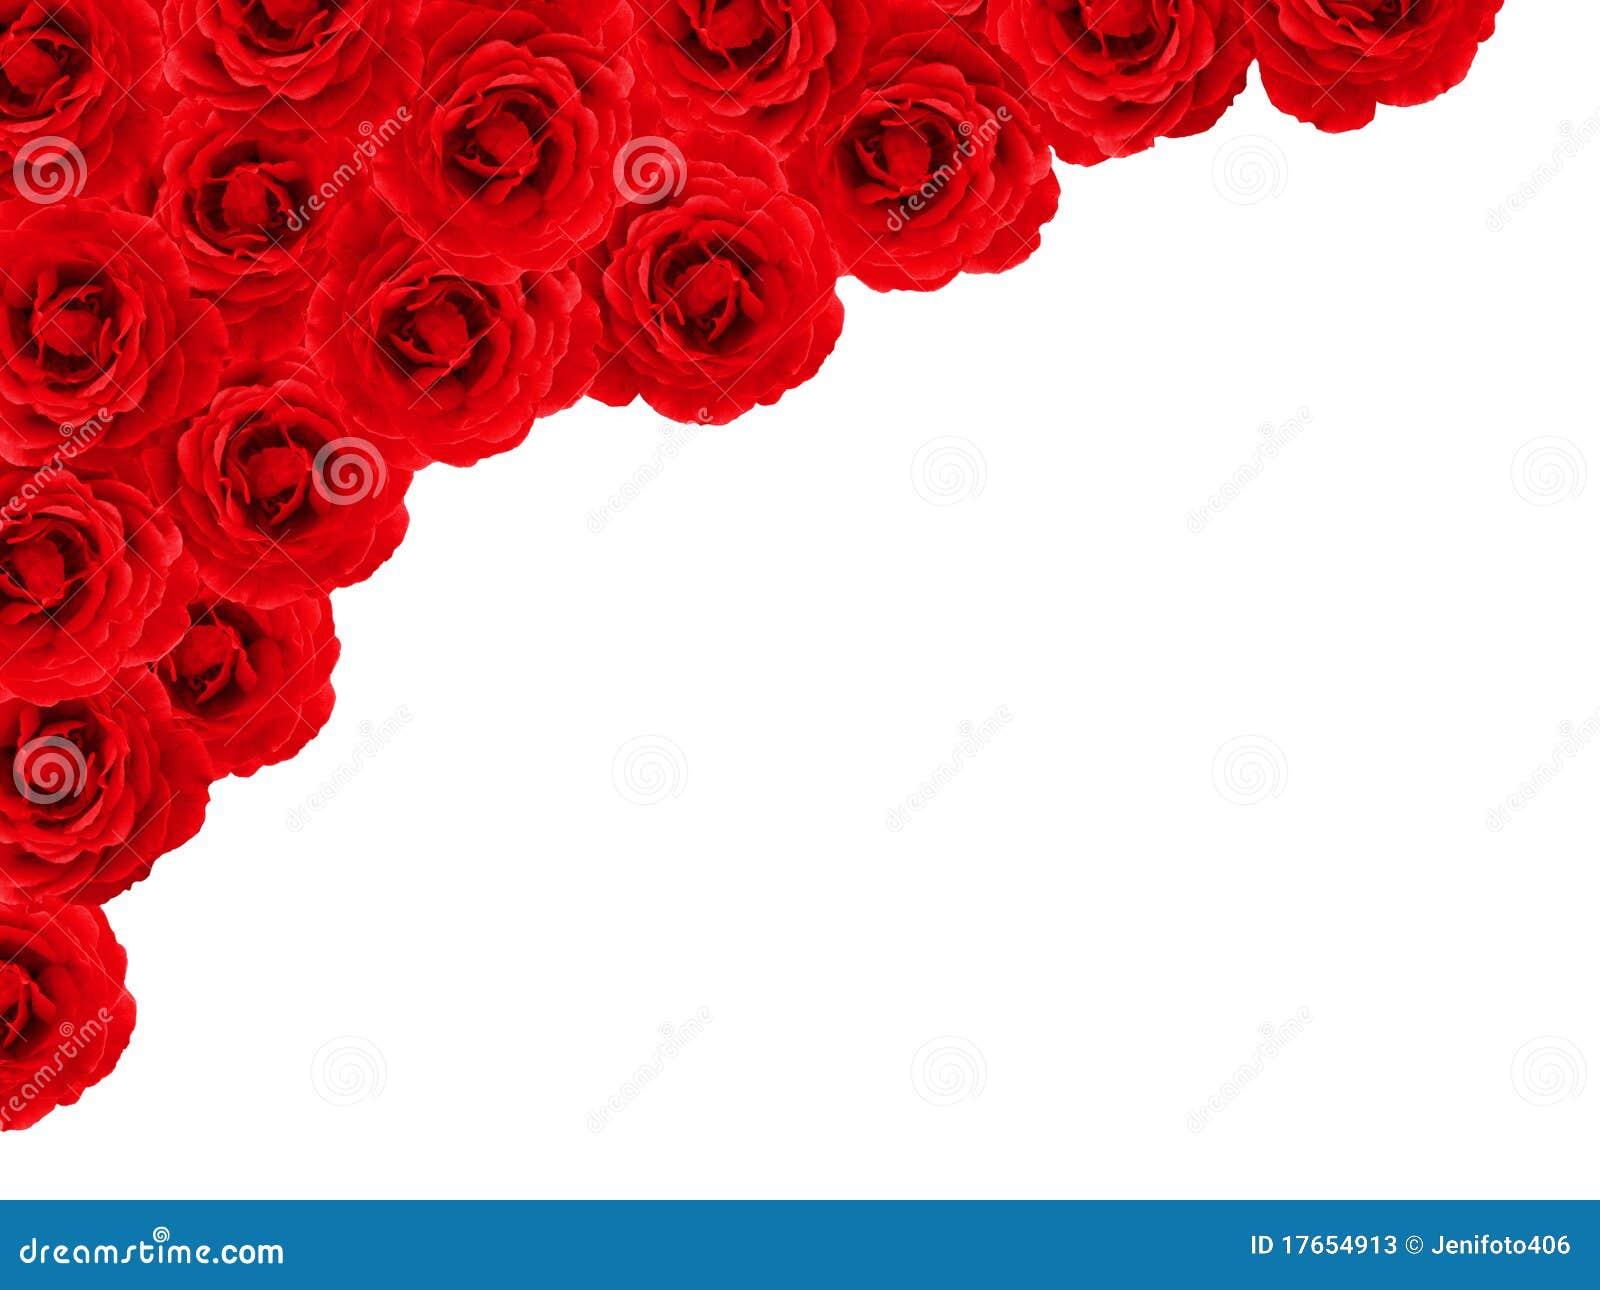 Rose Border Stock Photos - Image: 17654913